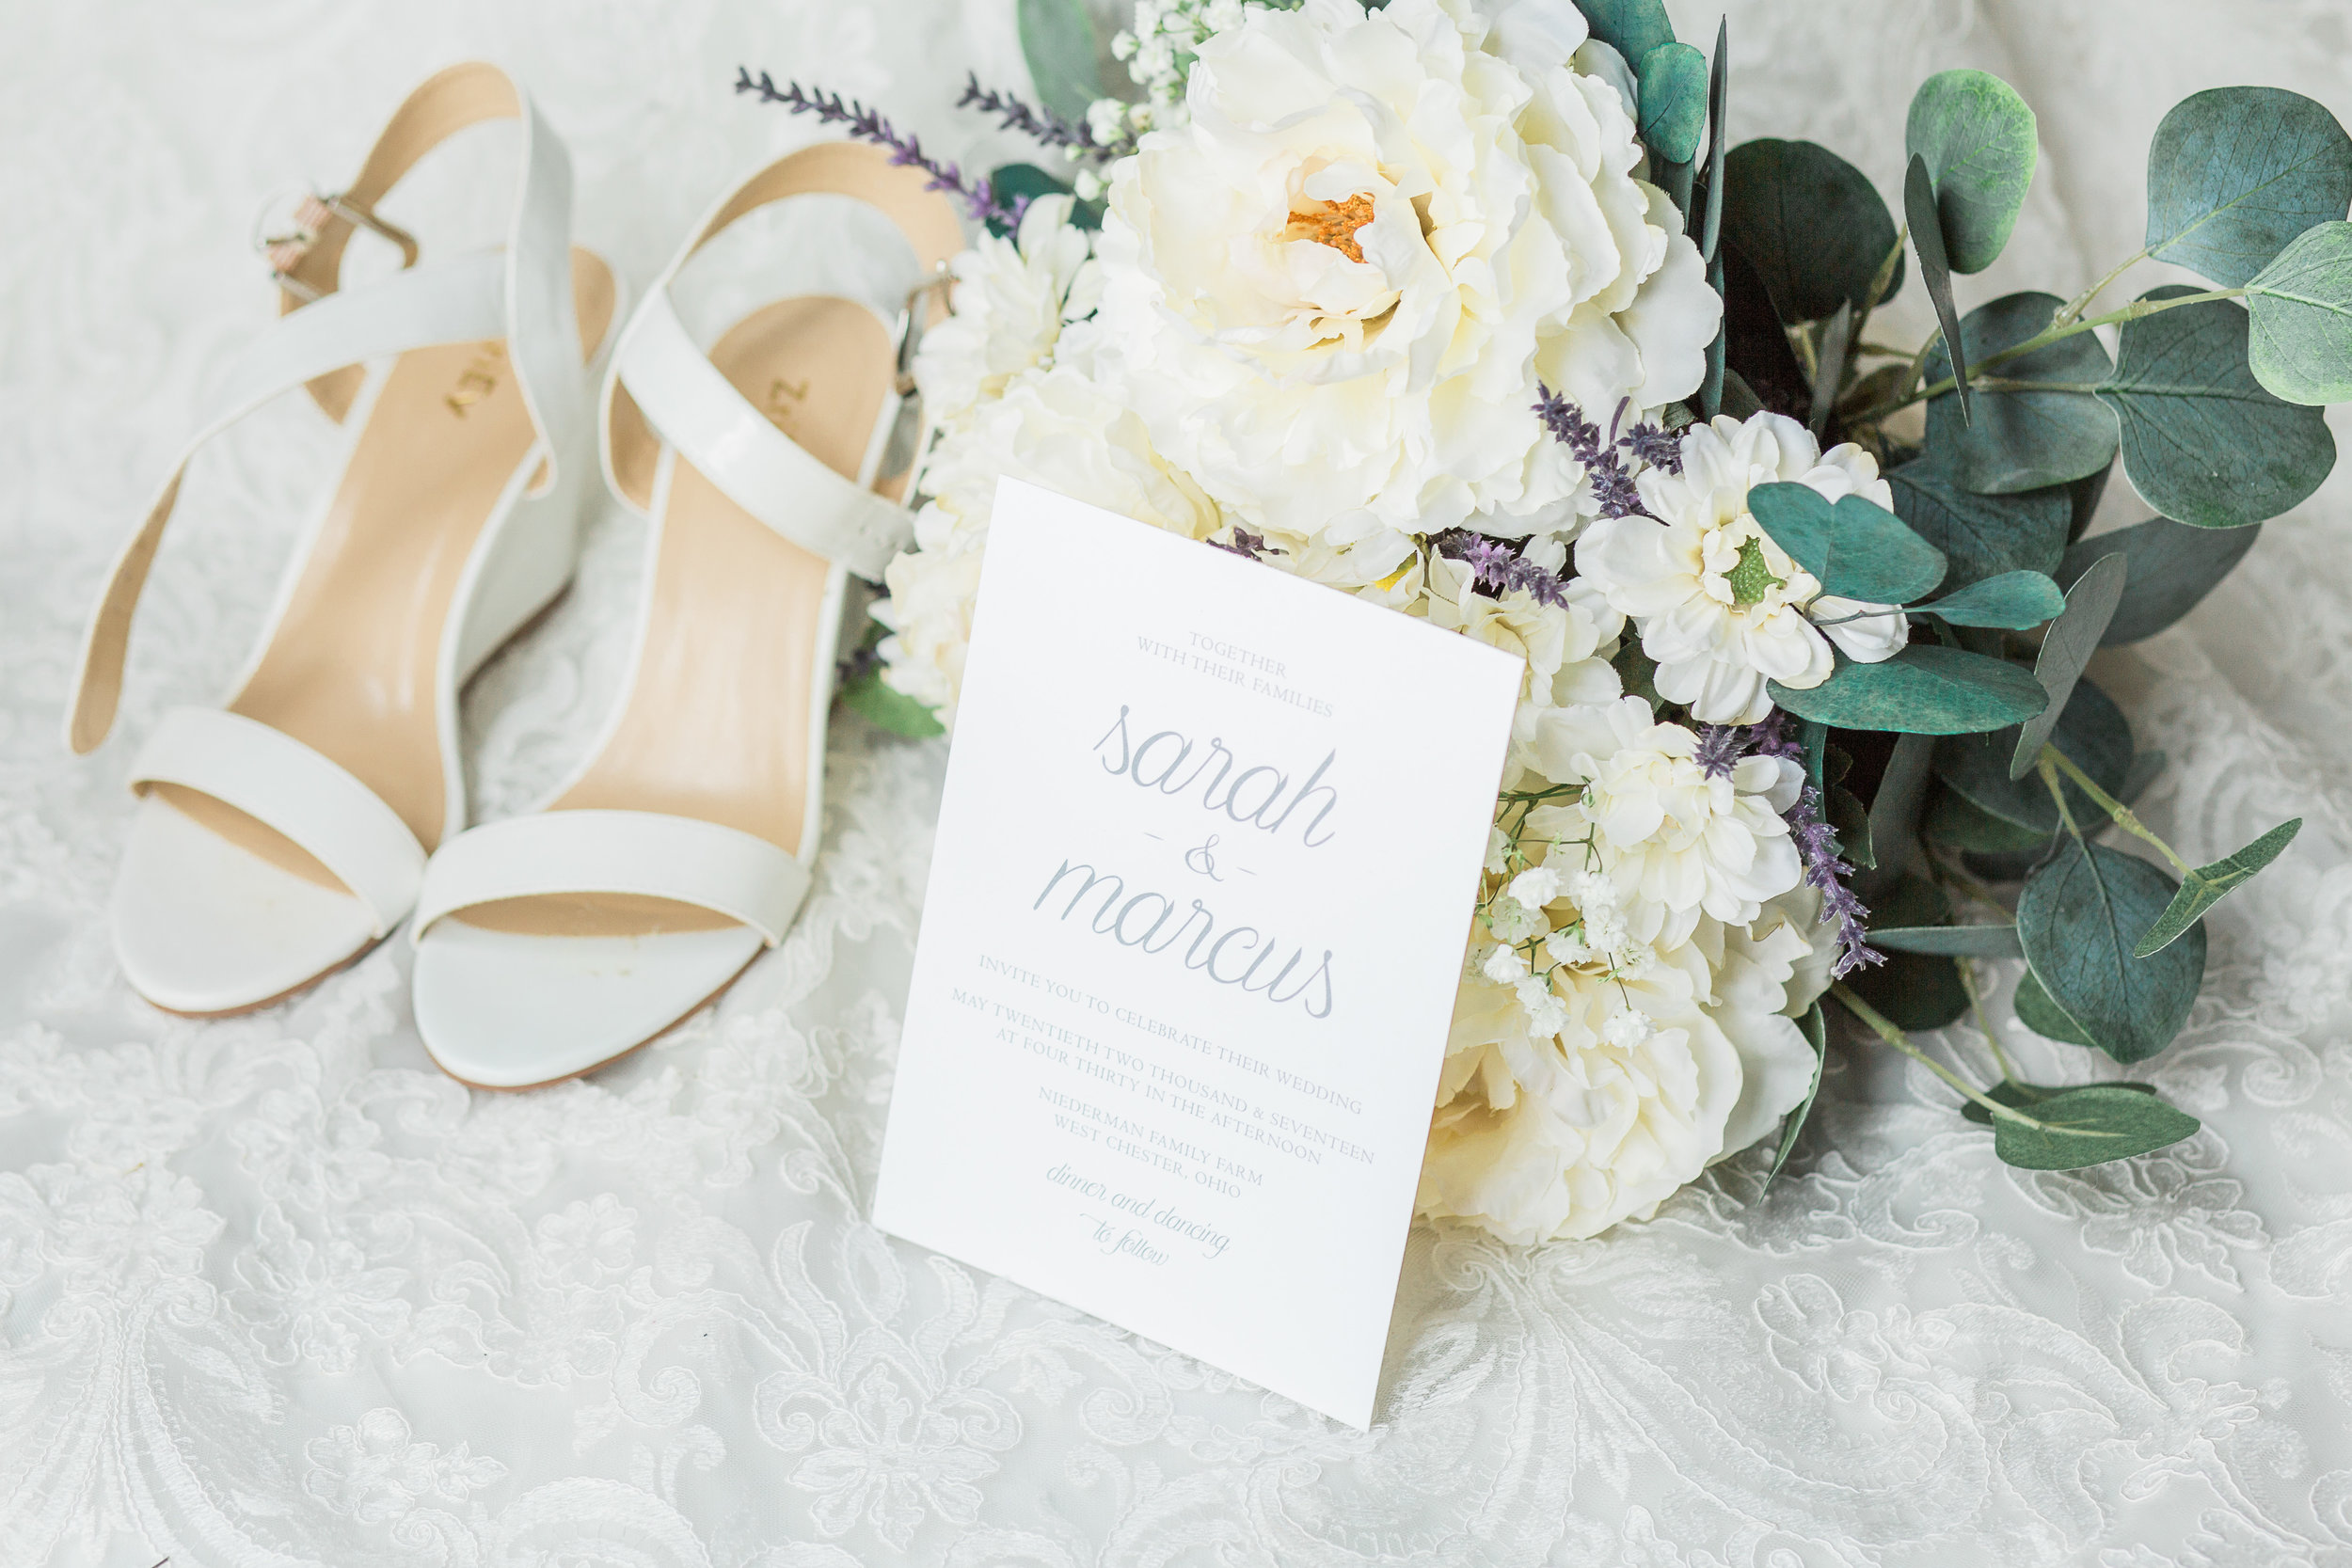 sarah-marcus-married-20 copy.jpg